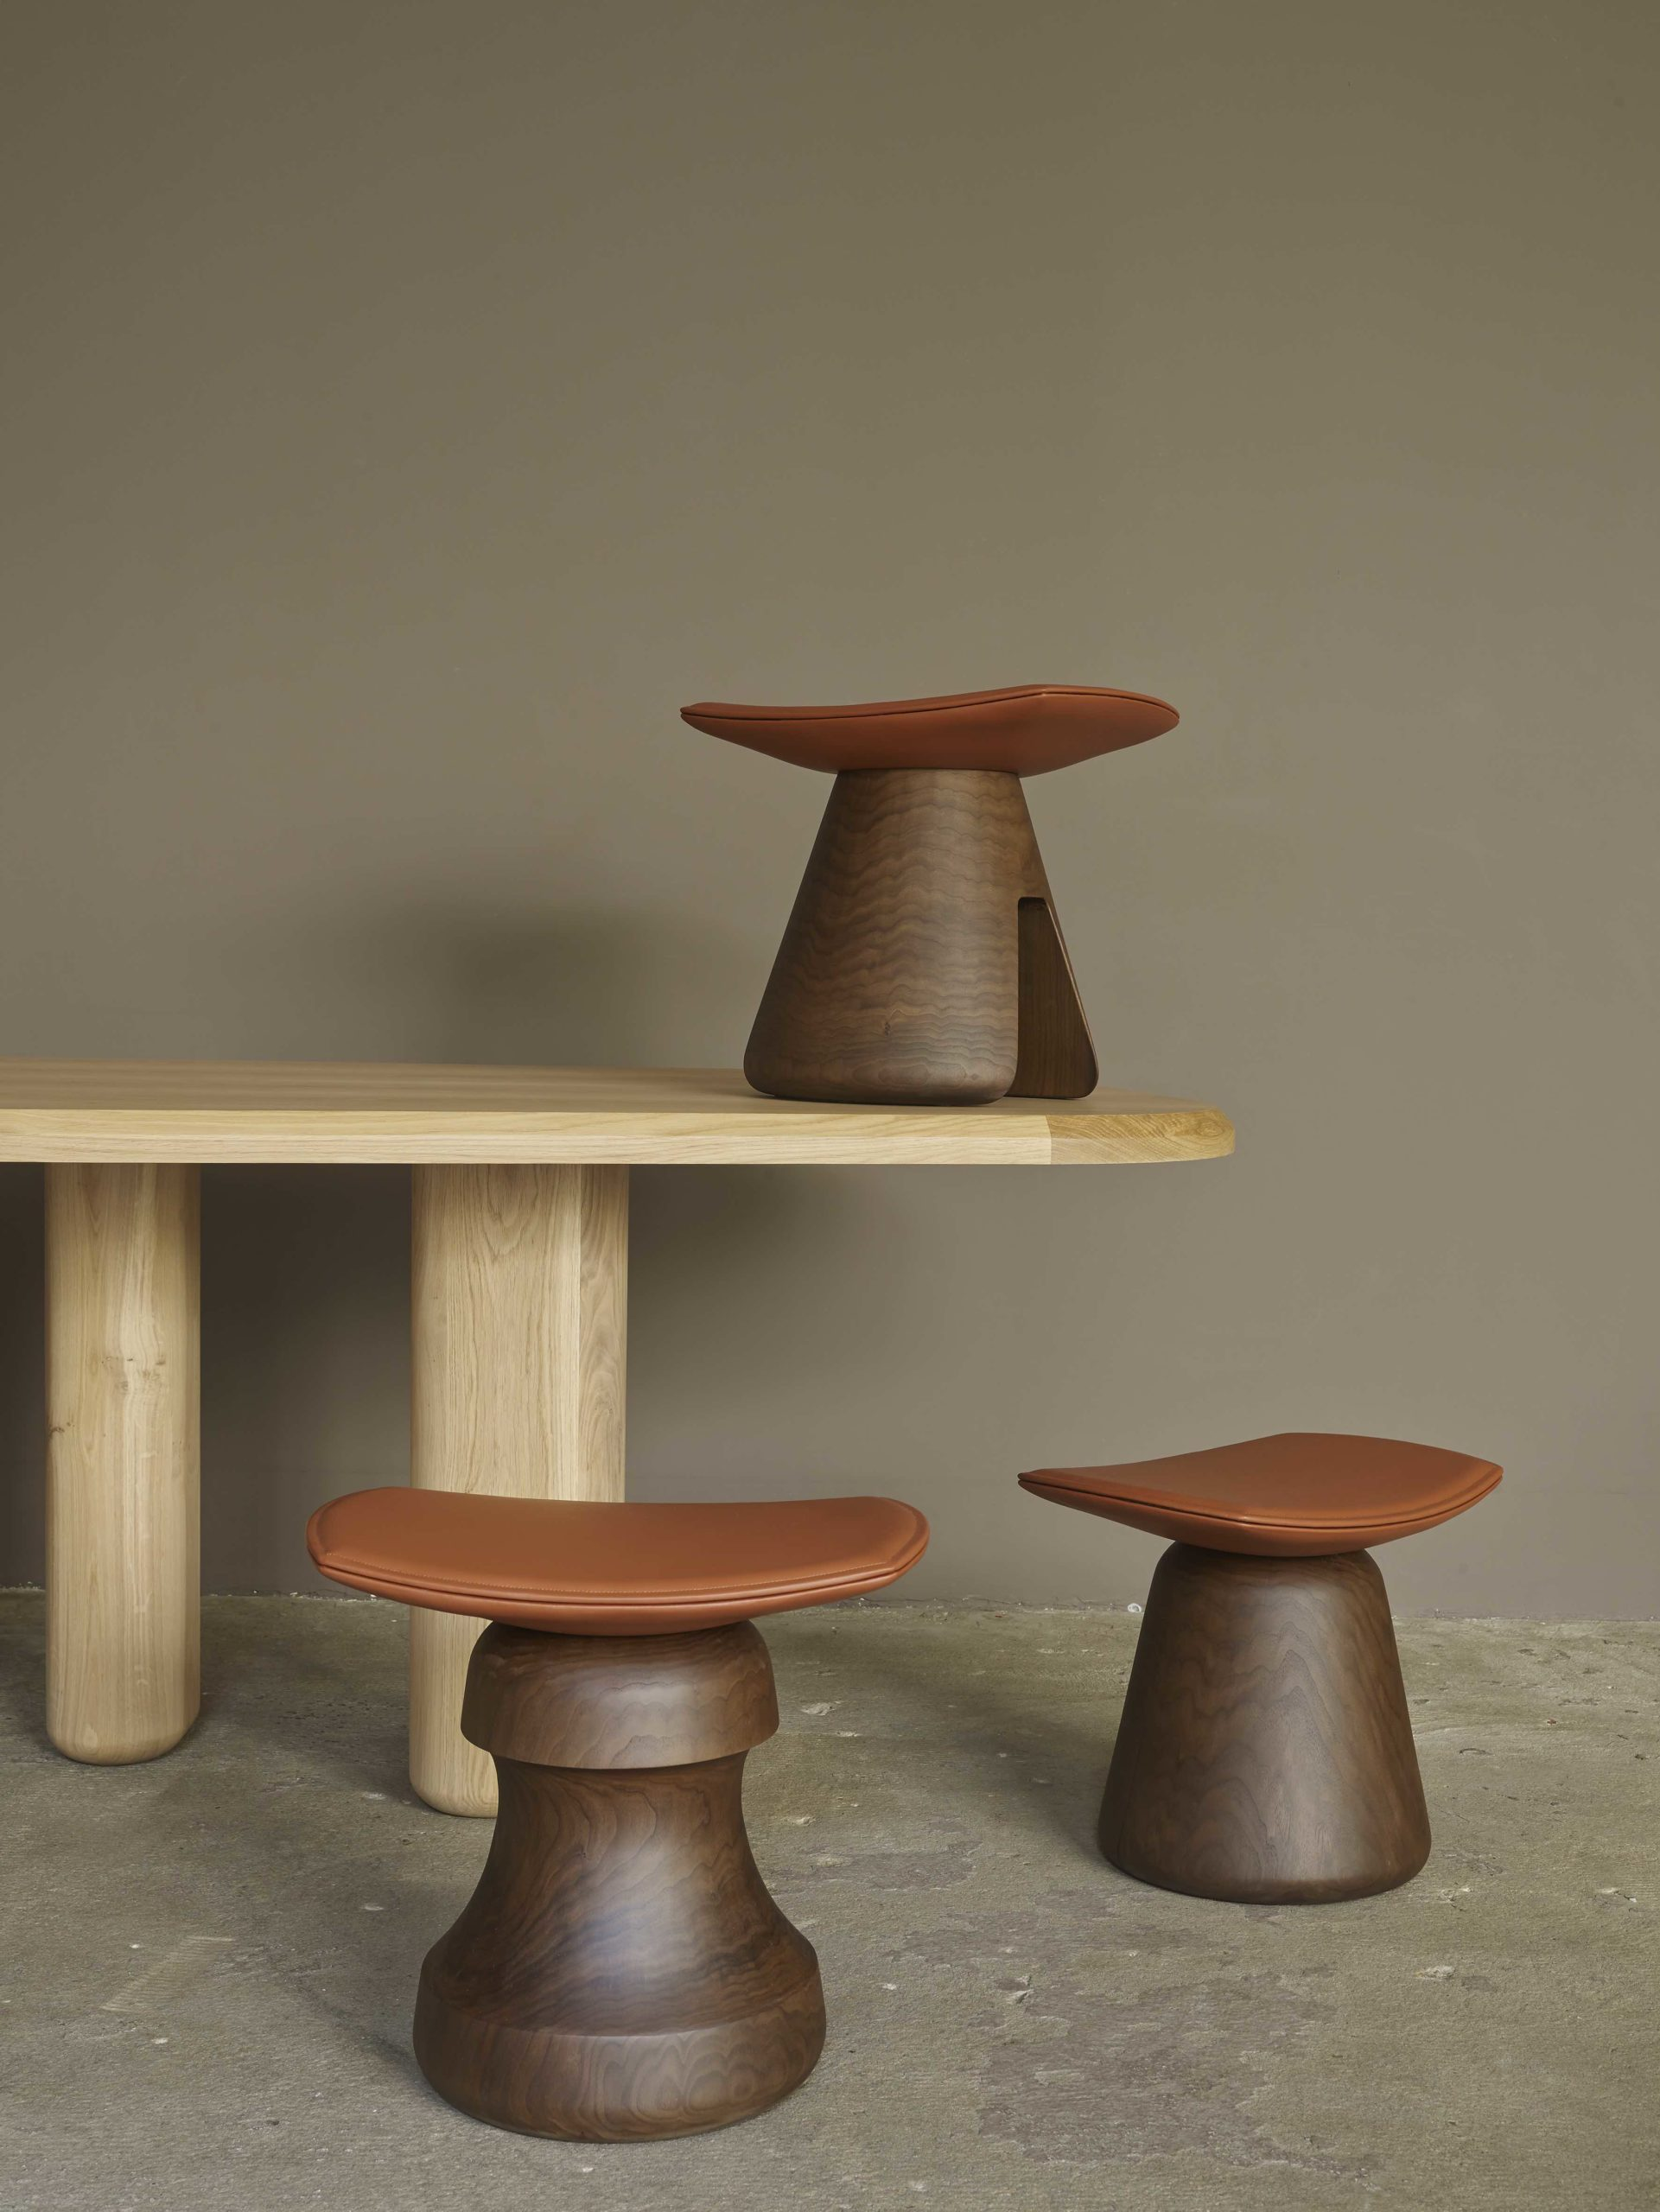 STOOLS-fou-roi-mat-design-christophedelcourt#collection-particulière